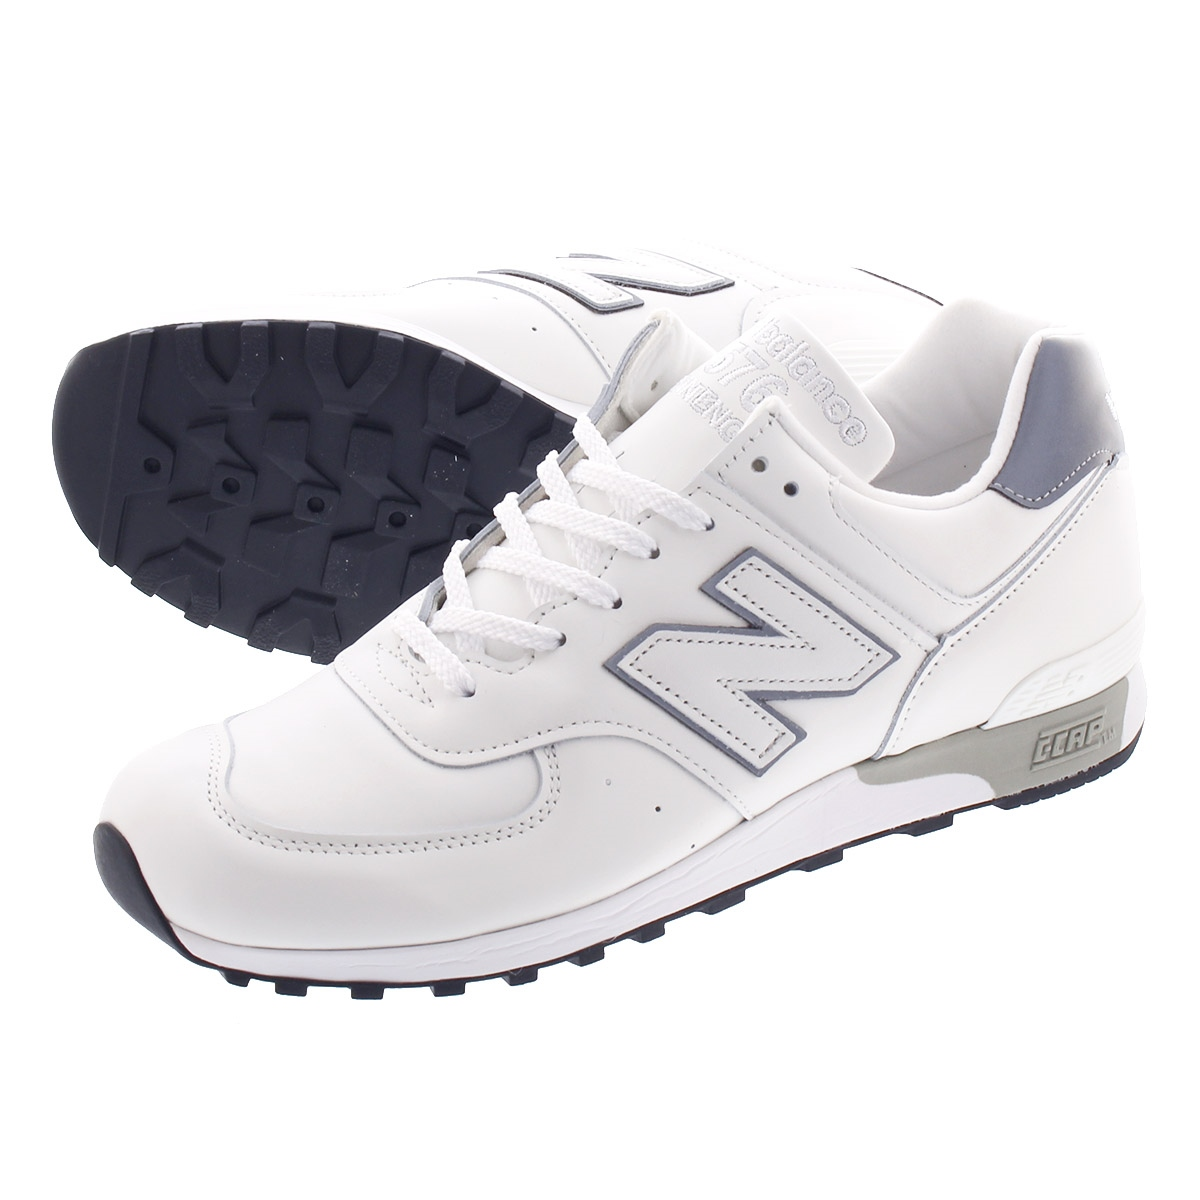 online store 7264f 5788f NEW BALANCE M576WWL New Balance M 576 WWL WHITE